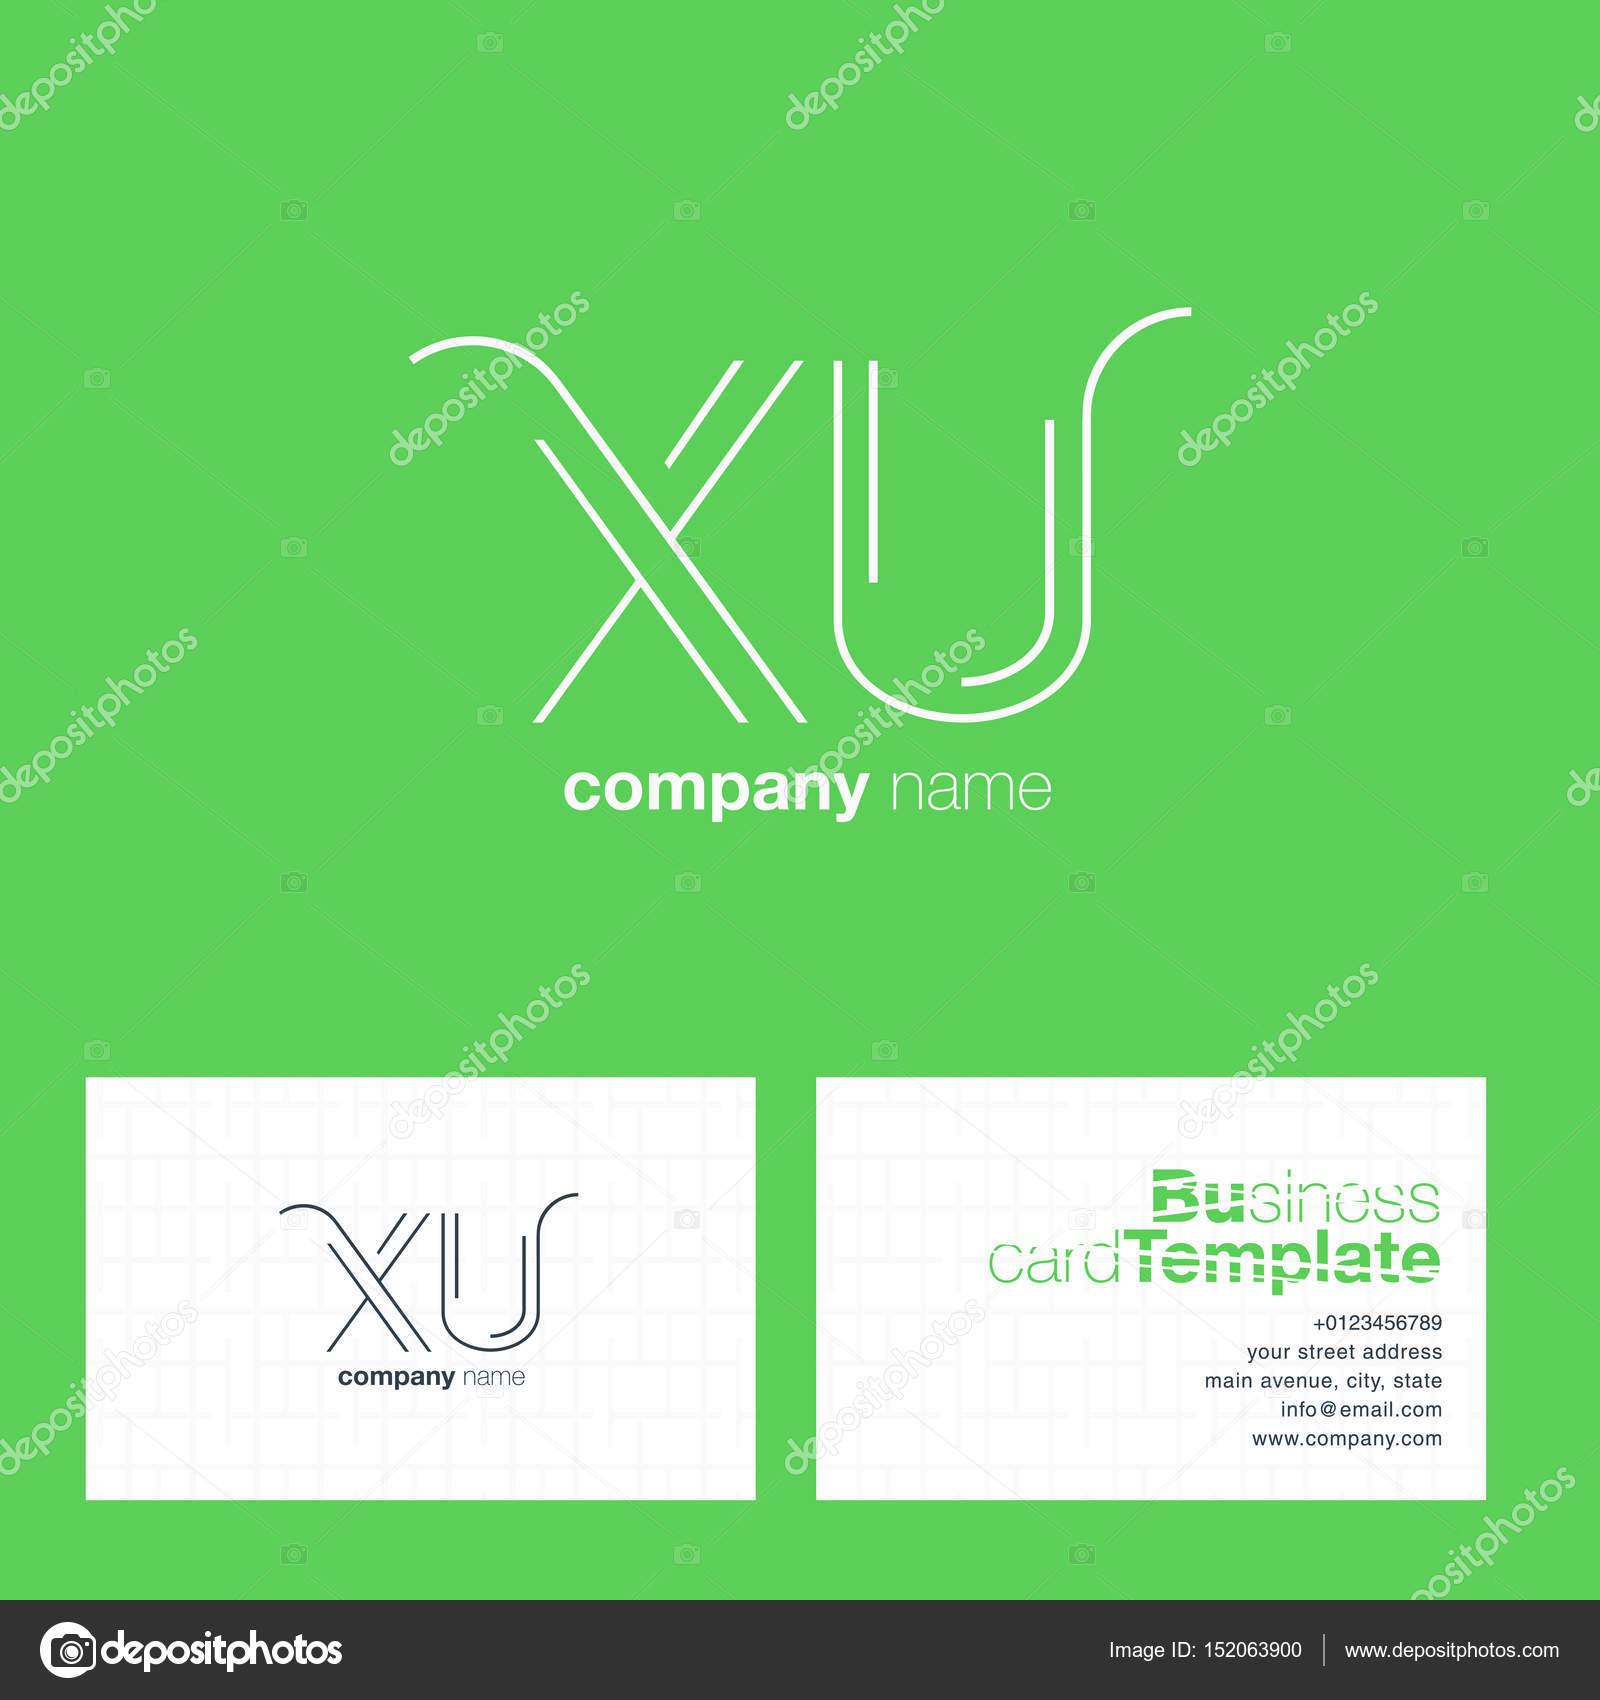 Xu letters logo business card vetor de stock brainbistro 152063900 xu letters logo business card vetor de stock reheart Images